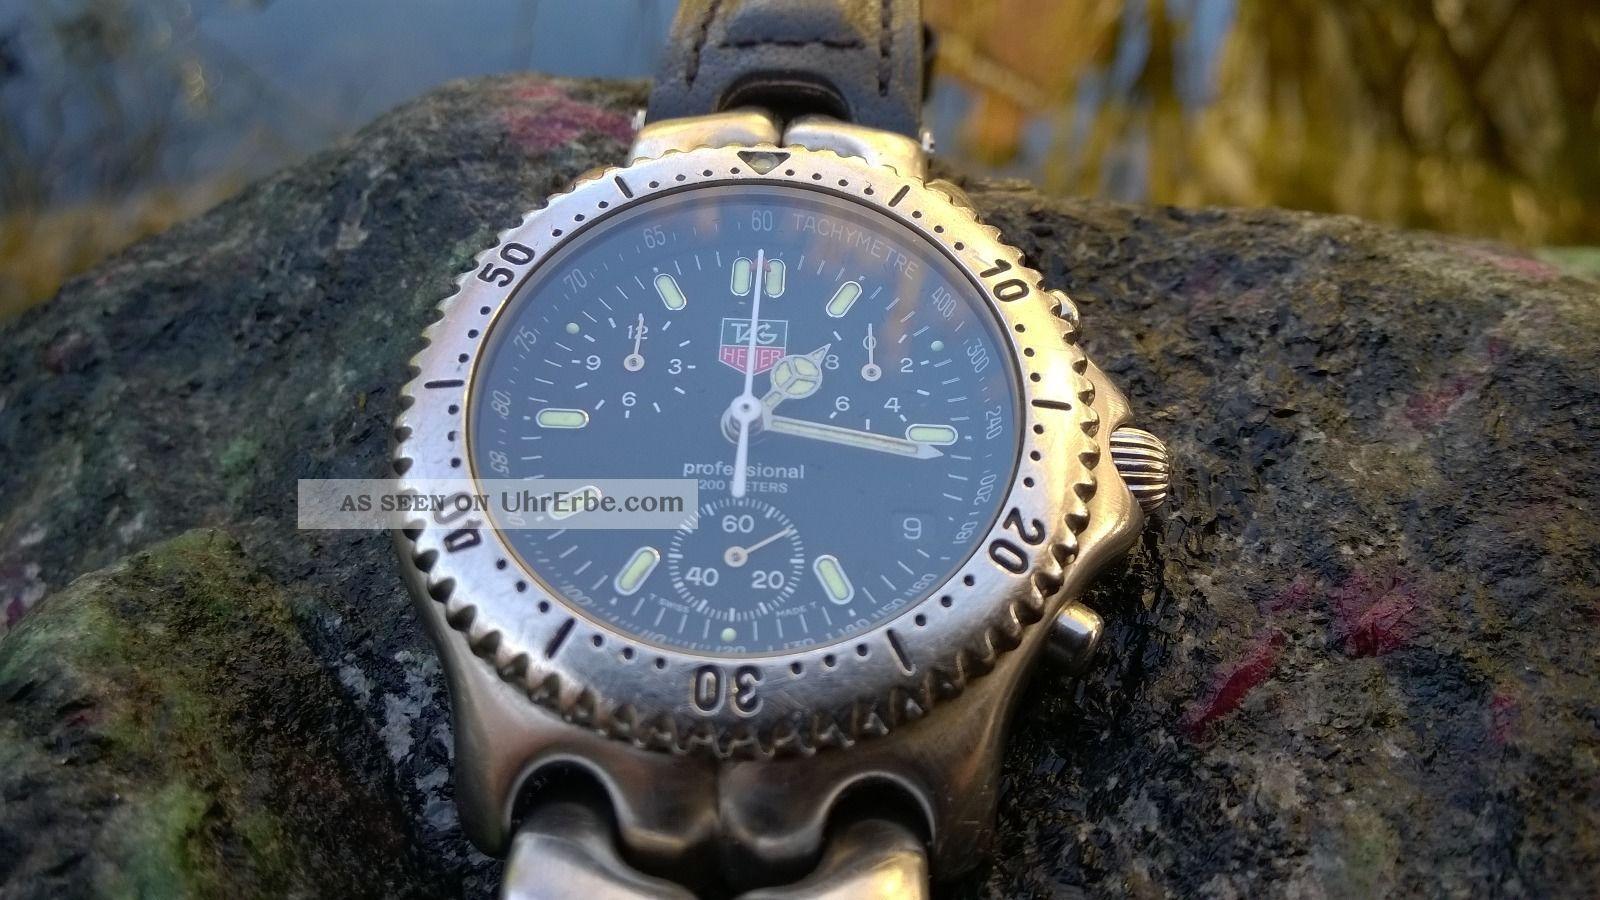 Tag Heuer - Men´s Professioal Sel Chronograph - Cg 1110 - 0 Armbanduhren Bild